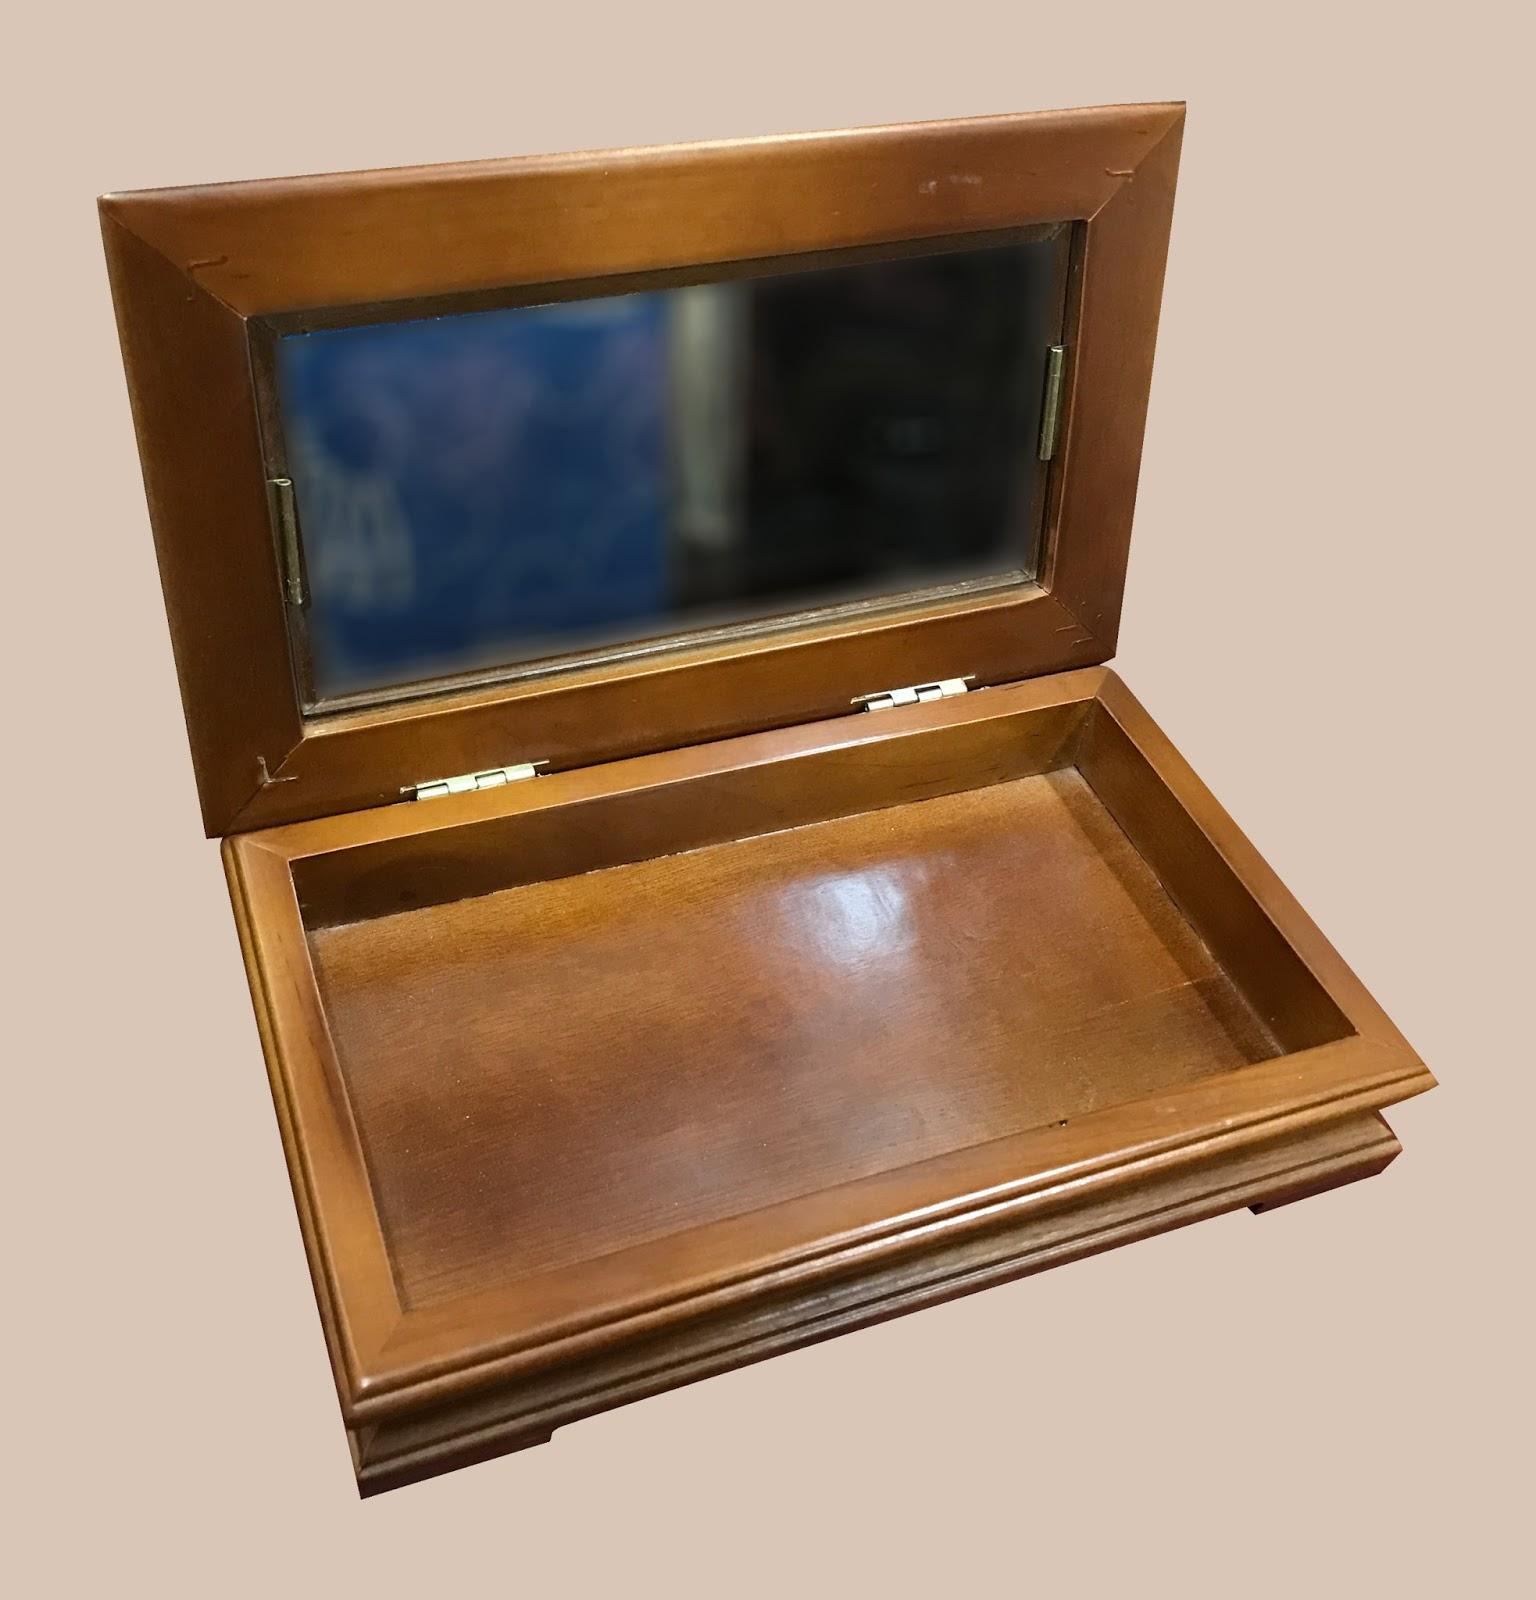 Uhuru Furniture Amp Collectibles Small Display Box 12